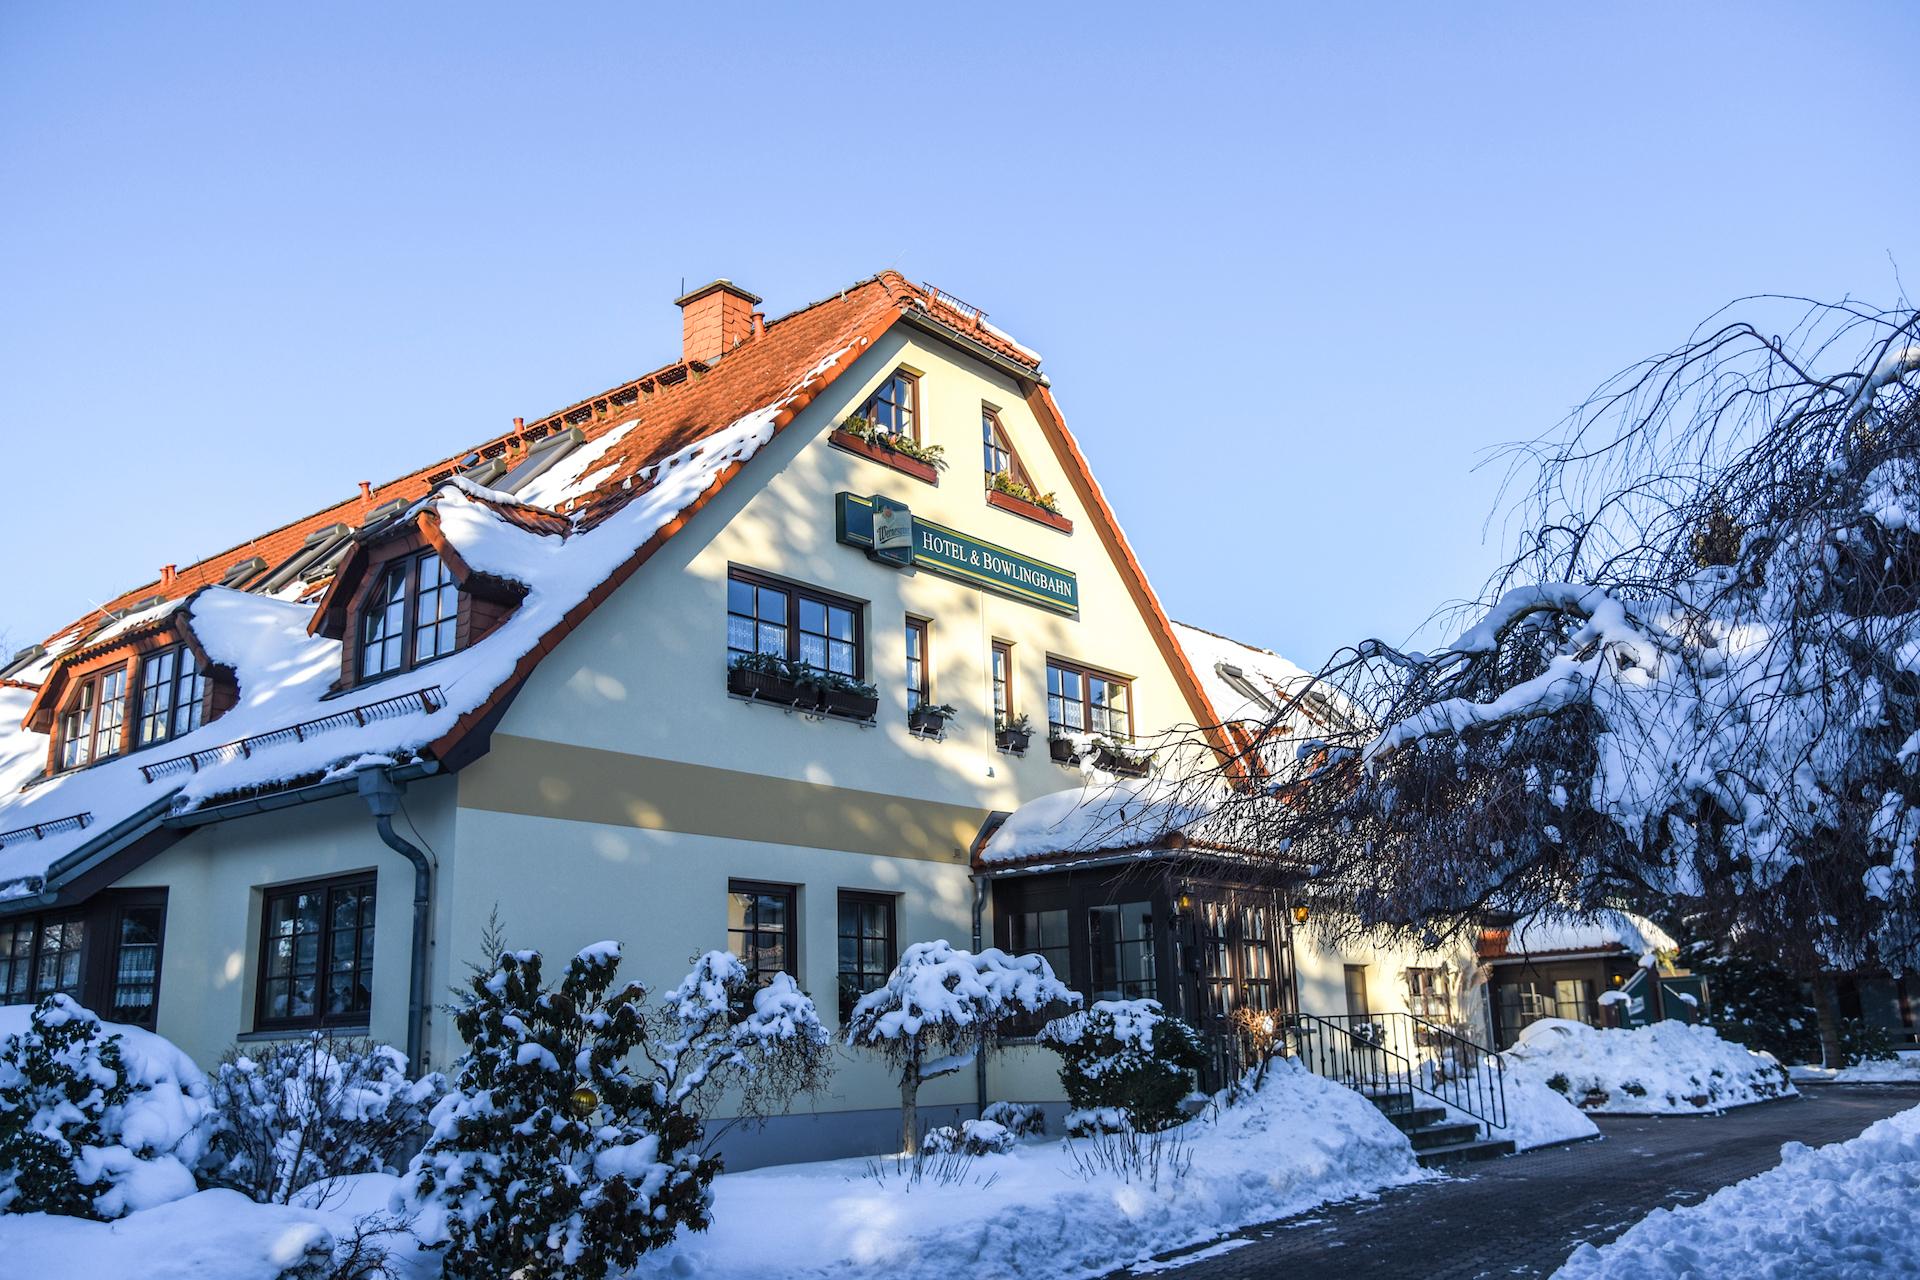 Hotel Waldblick - Pulsnitz (01896) - YellowMap  Hotel Waldblick...